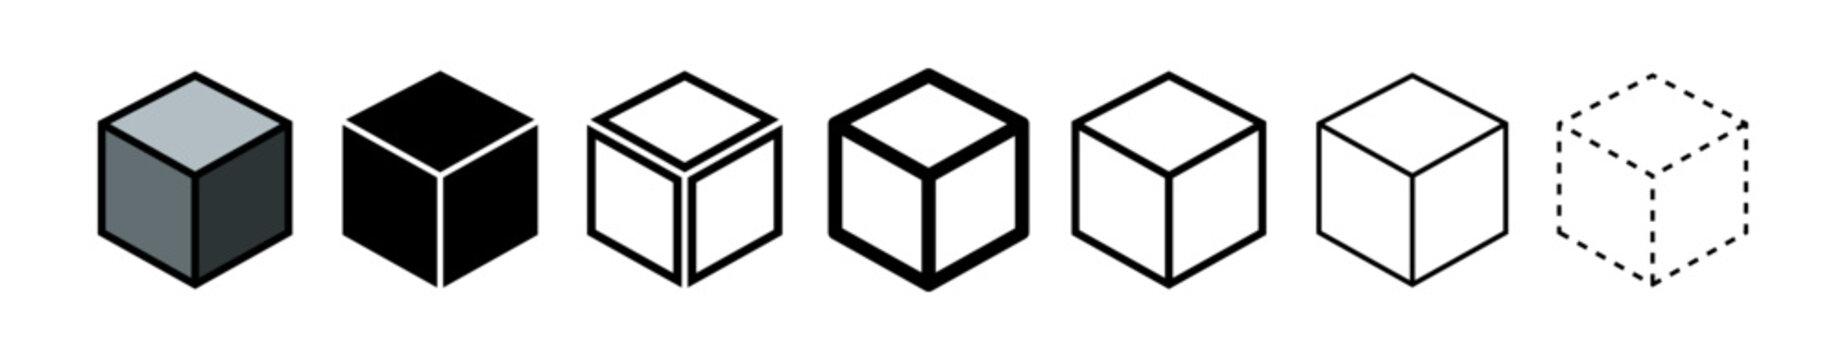 Set of cubes vector icons. Black simple cube pictogram. 3d box graphic concept. Graphic element vector.